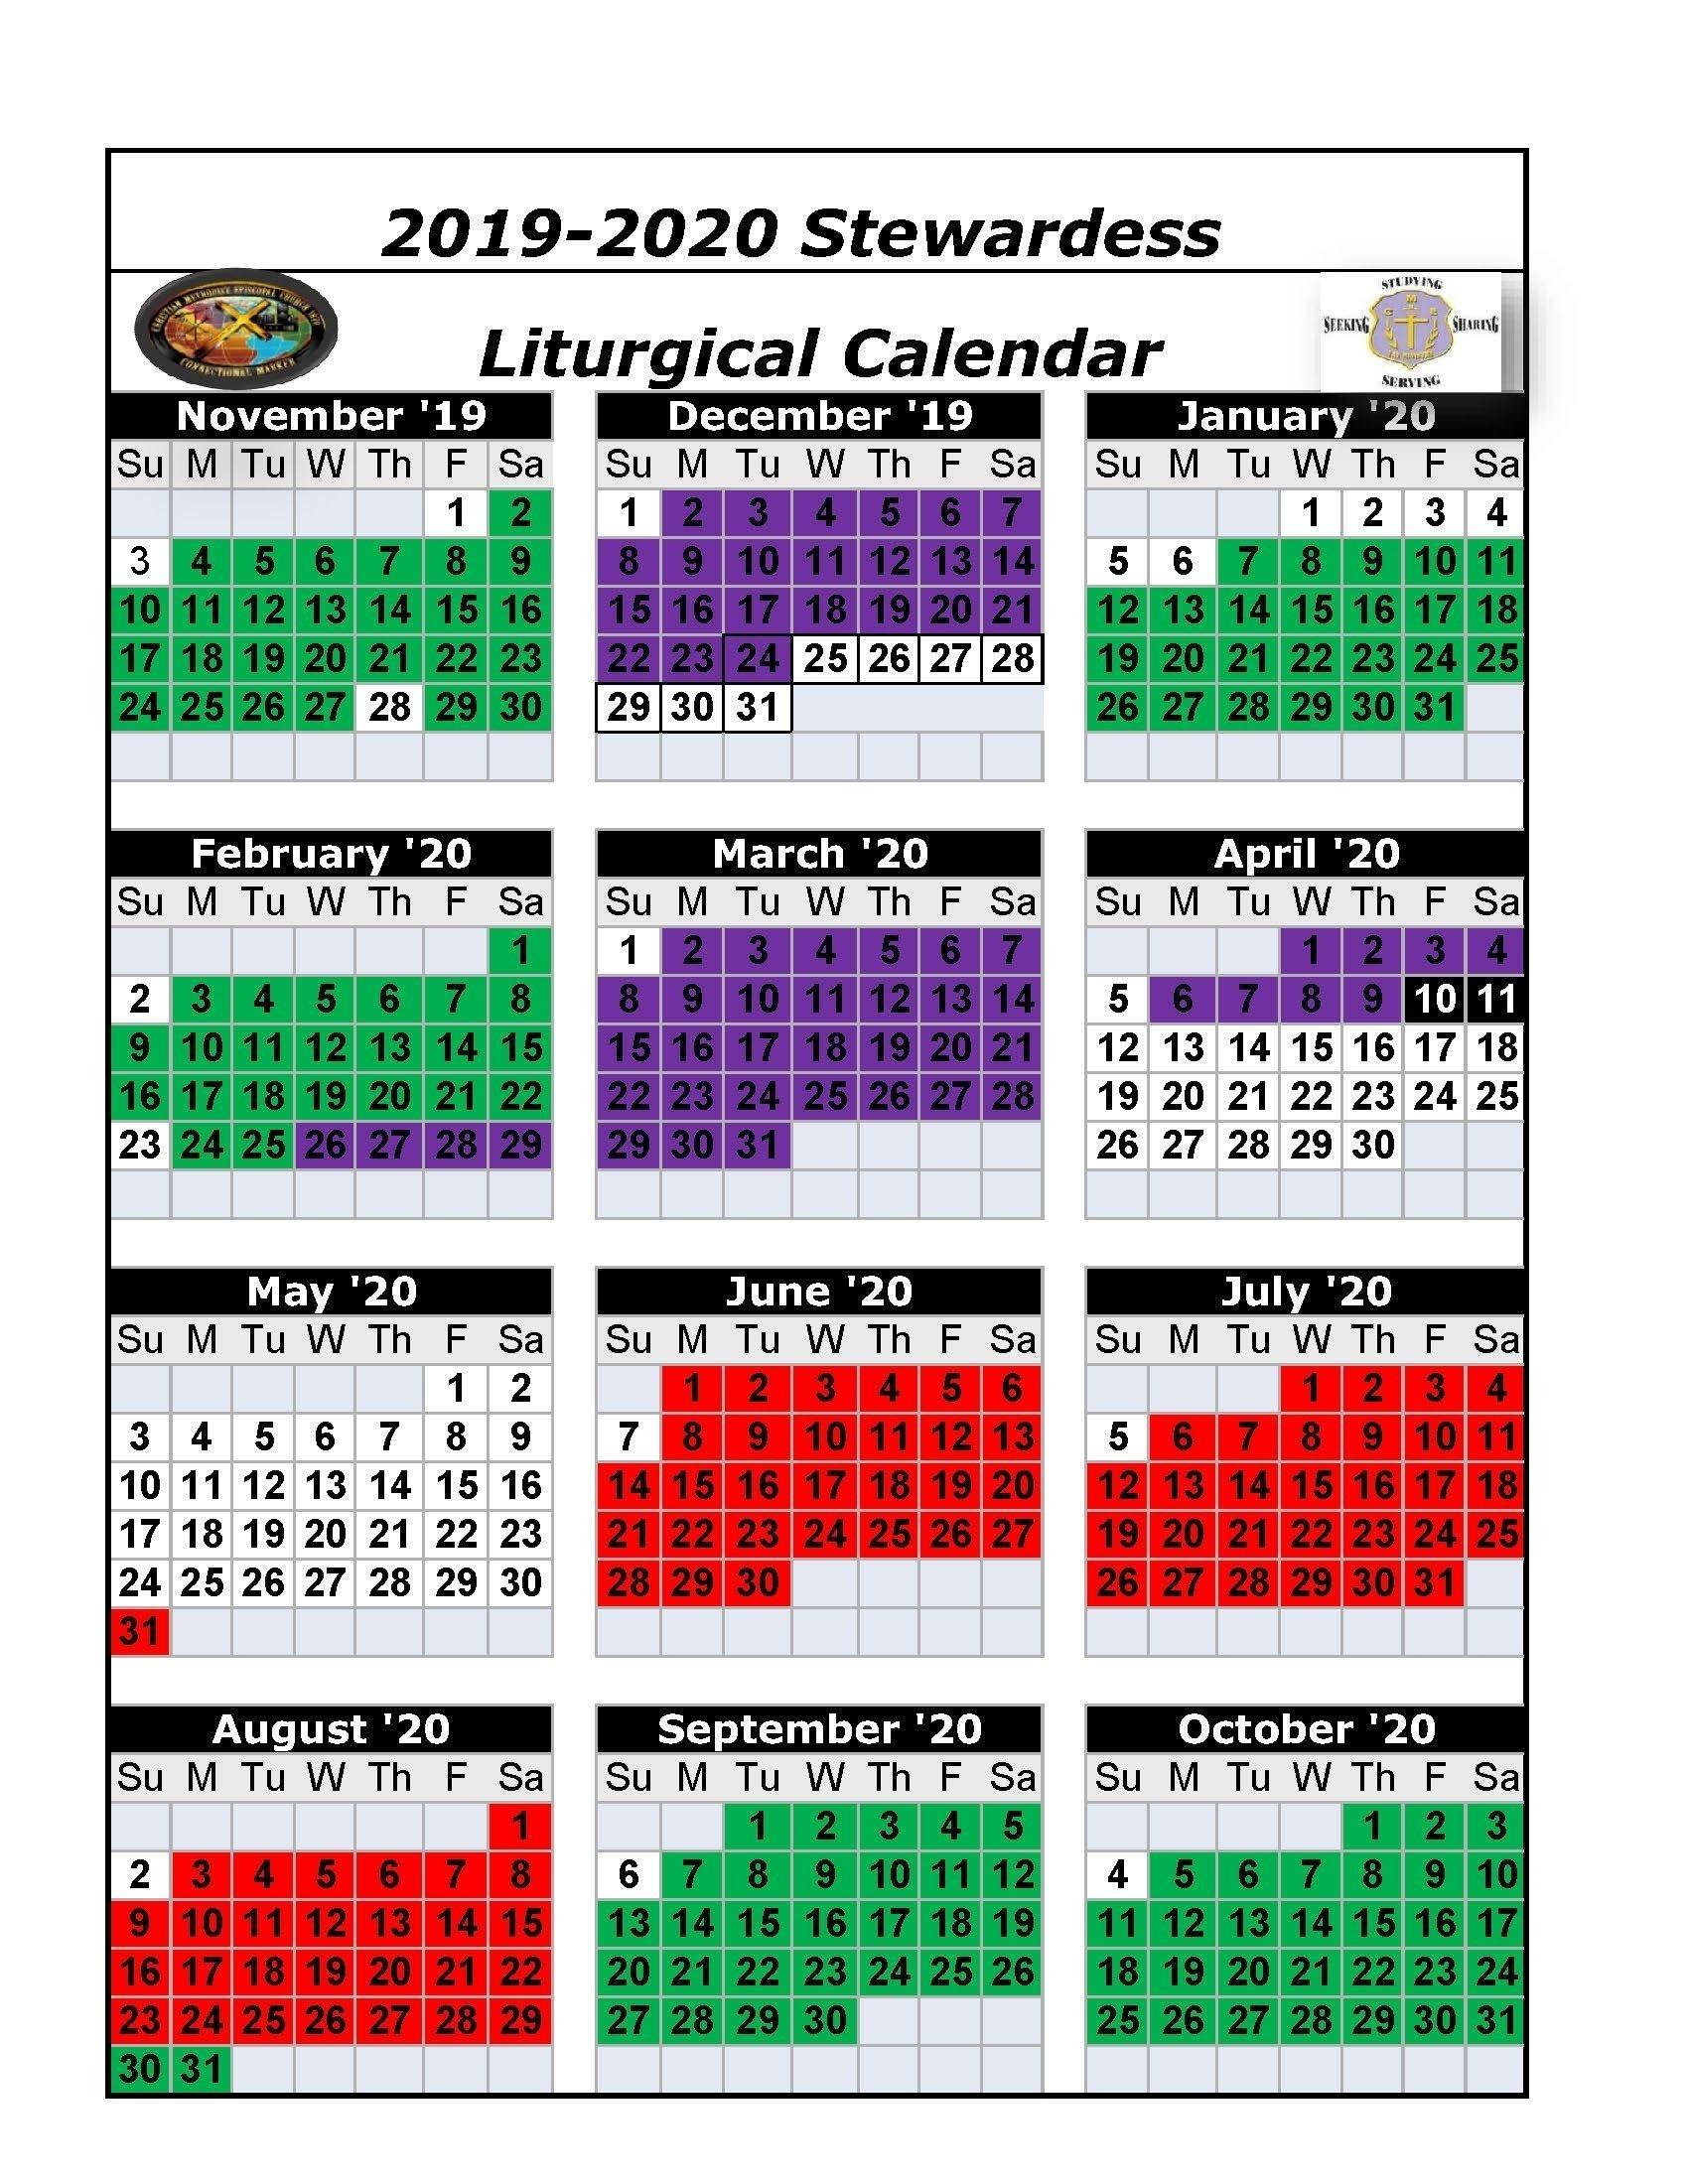 Downloadable Umc Liturgical Calendar 2020 In 2020 | Calendar  Liturgical Lectionary Umc 2021